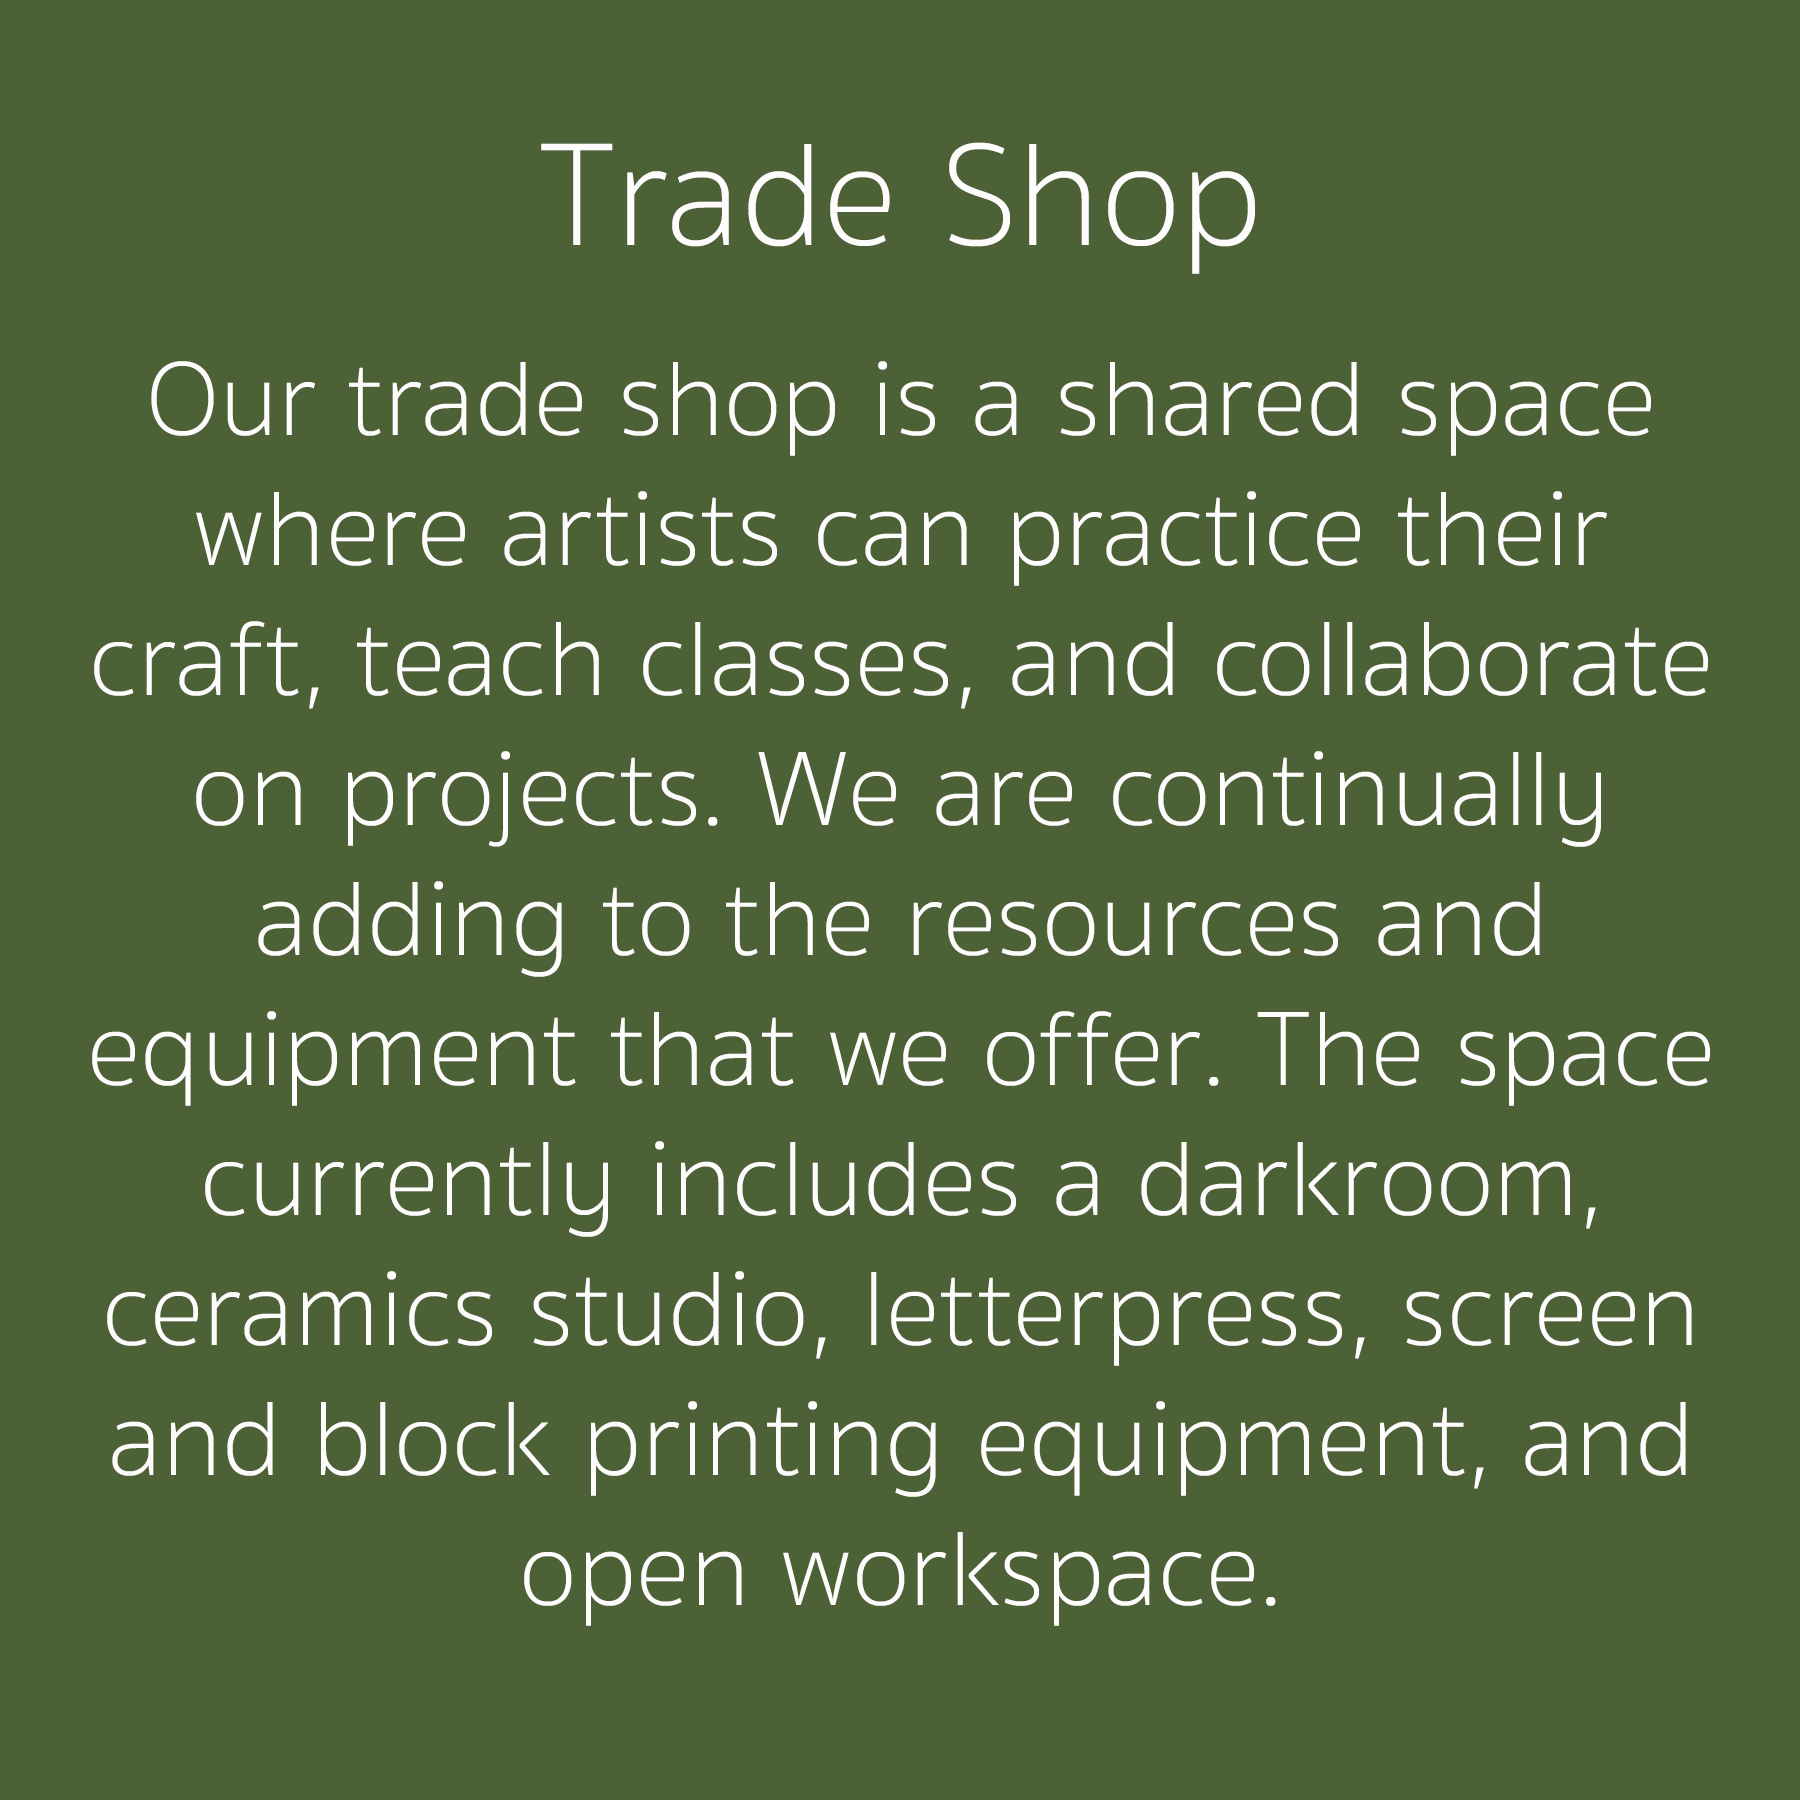 TradeShop.jpg